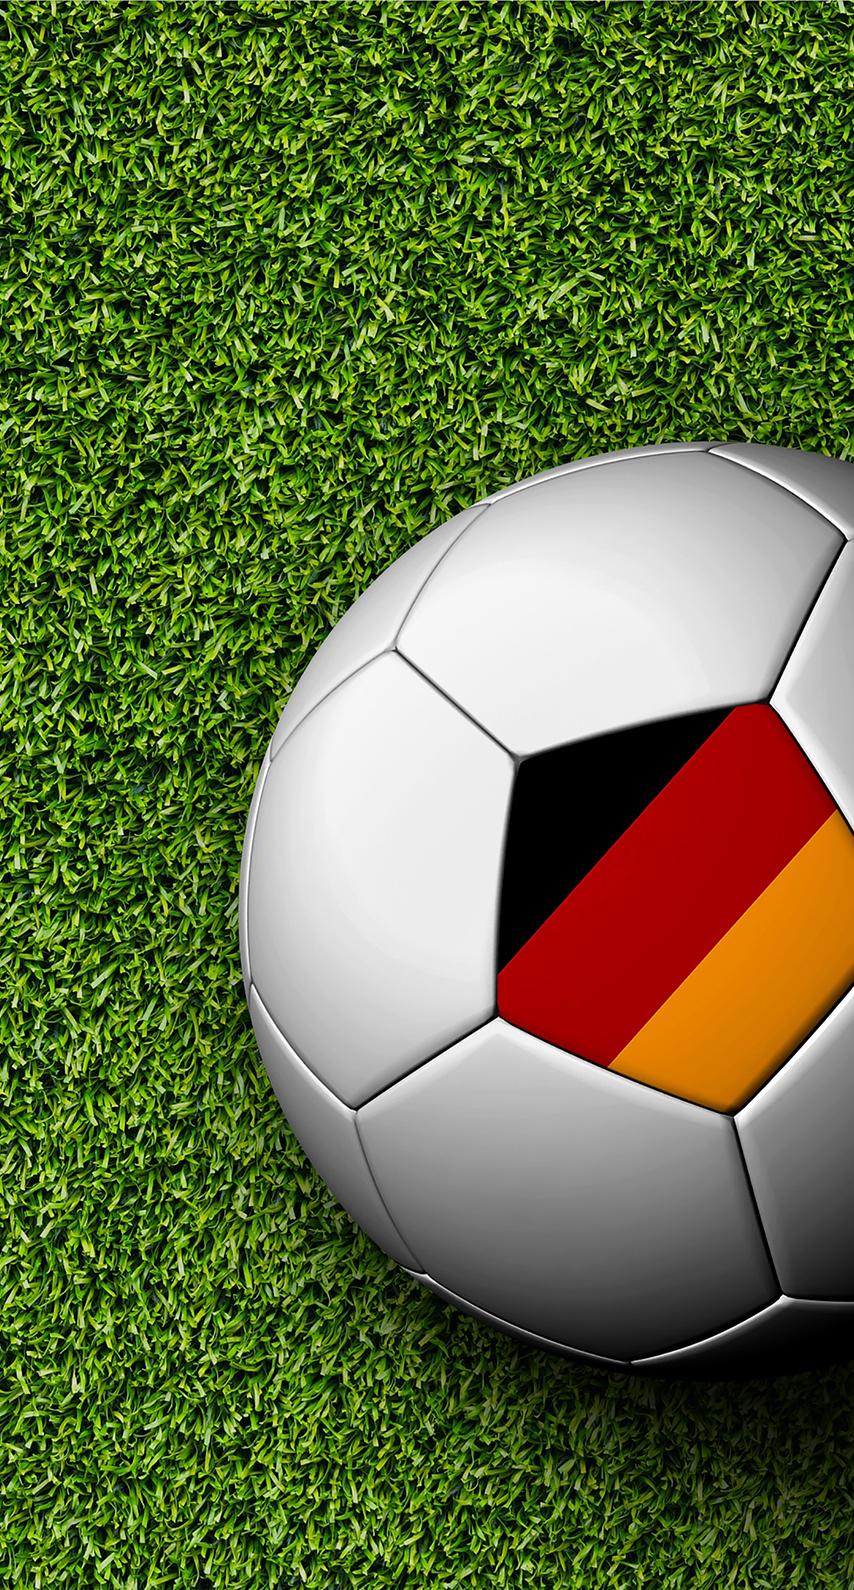 gameplan (sports), stadium, squad, soccer ball, playground, match, ground, league, score, pentagon